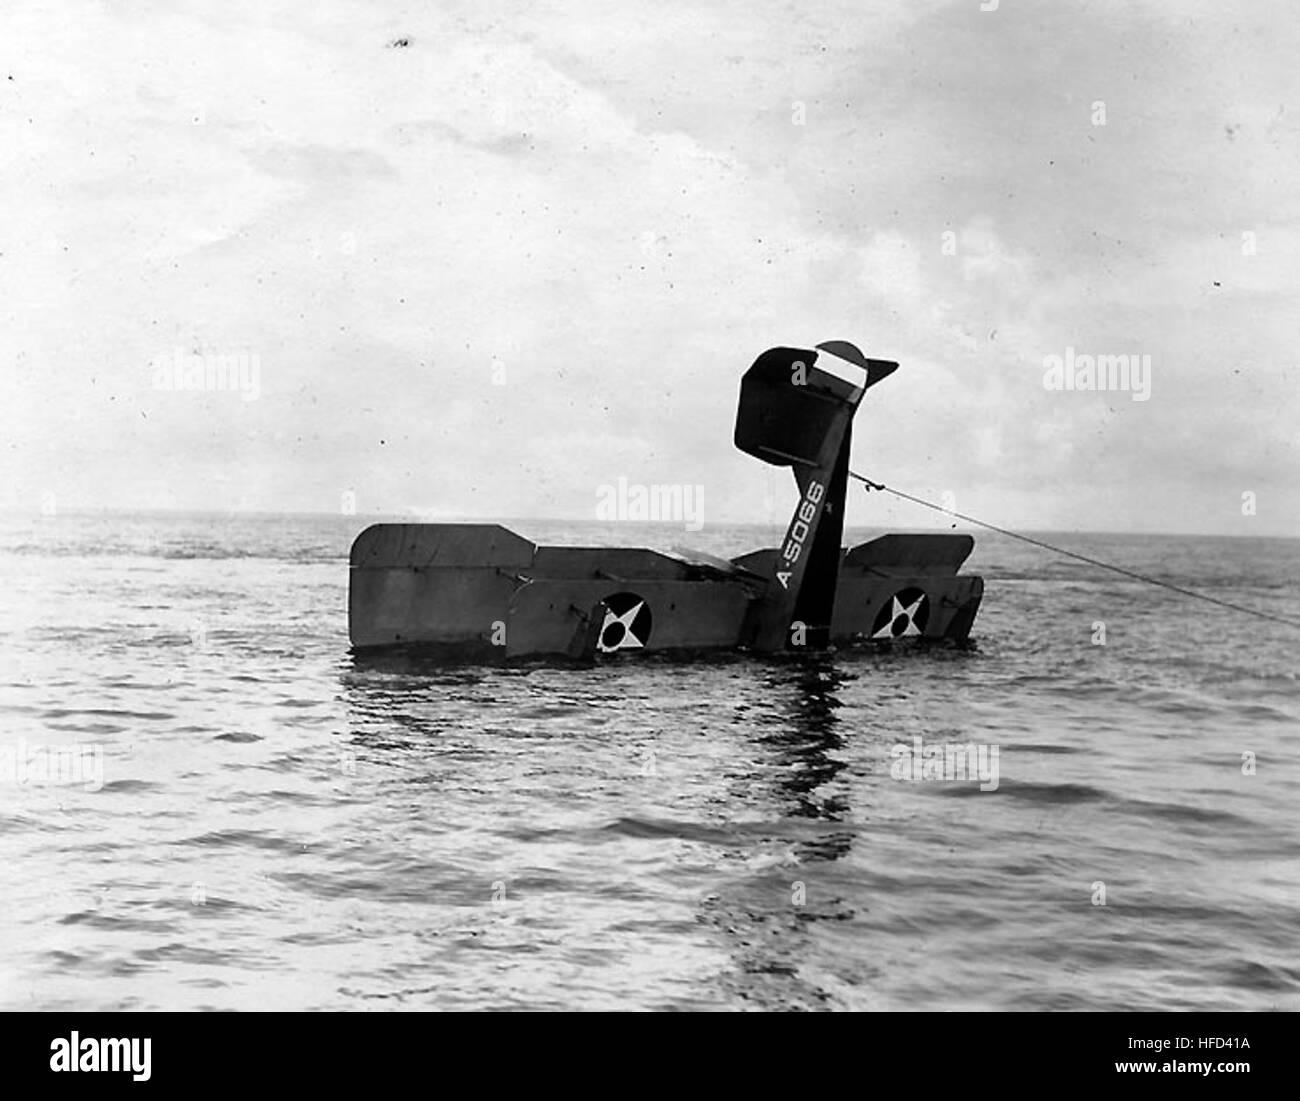 Aero-40 wreck - Stock Image